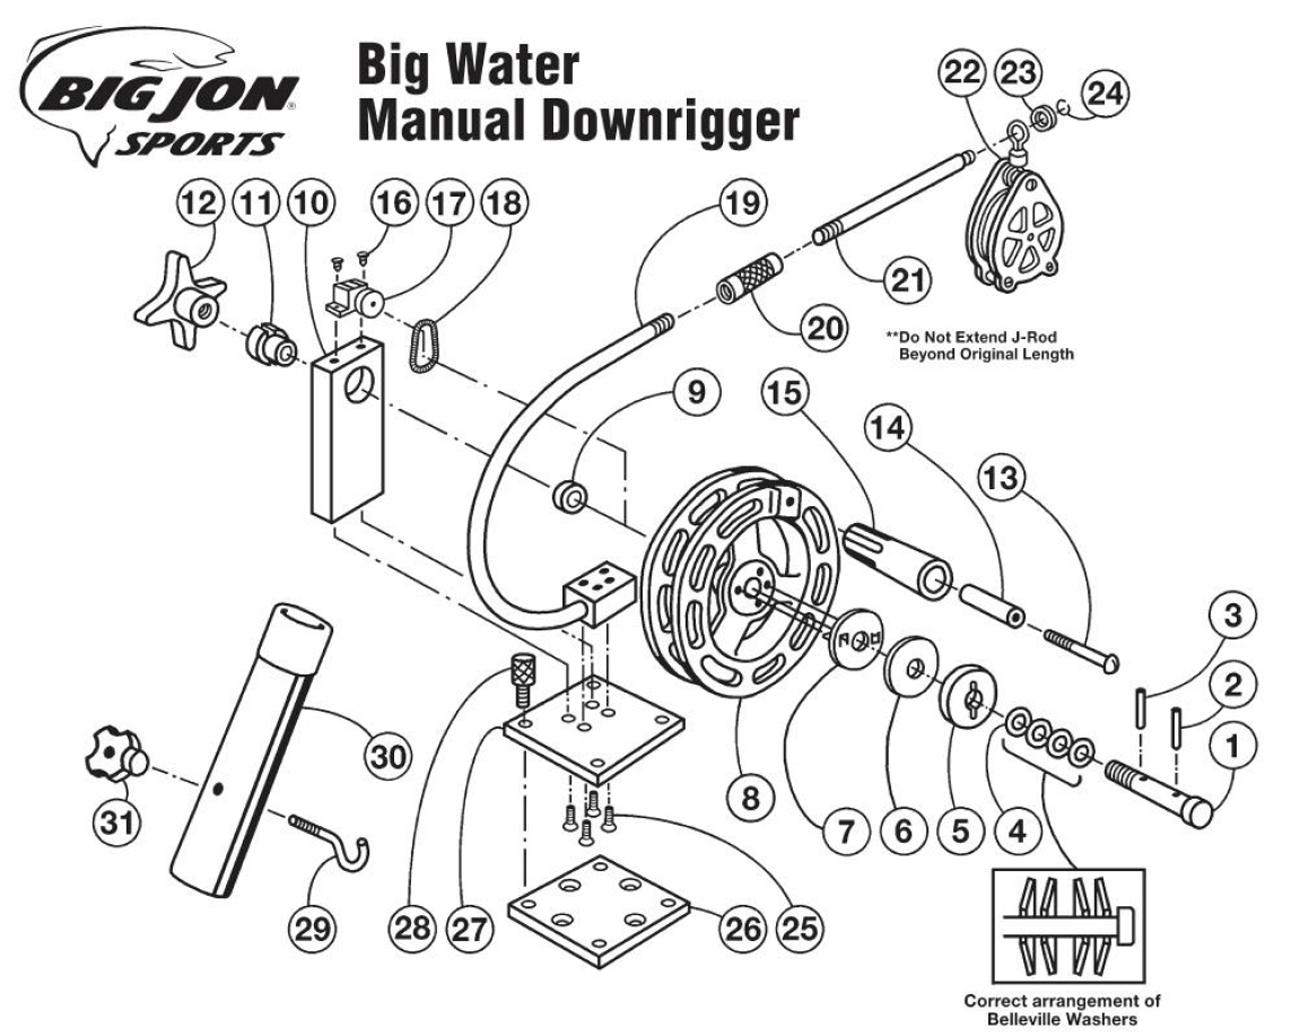 Big Jon Big Water Manual Downrigger Parts